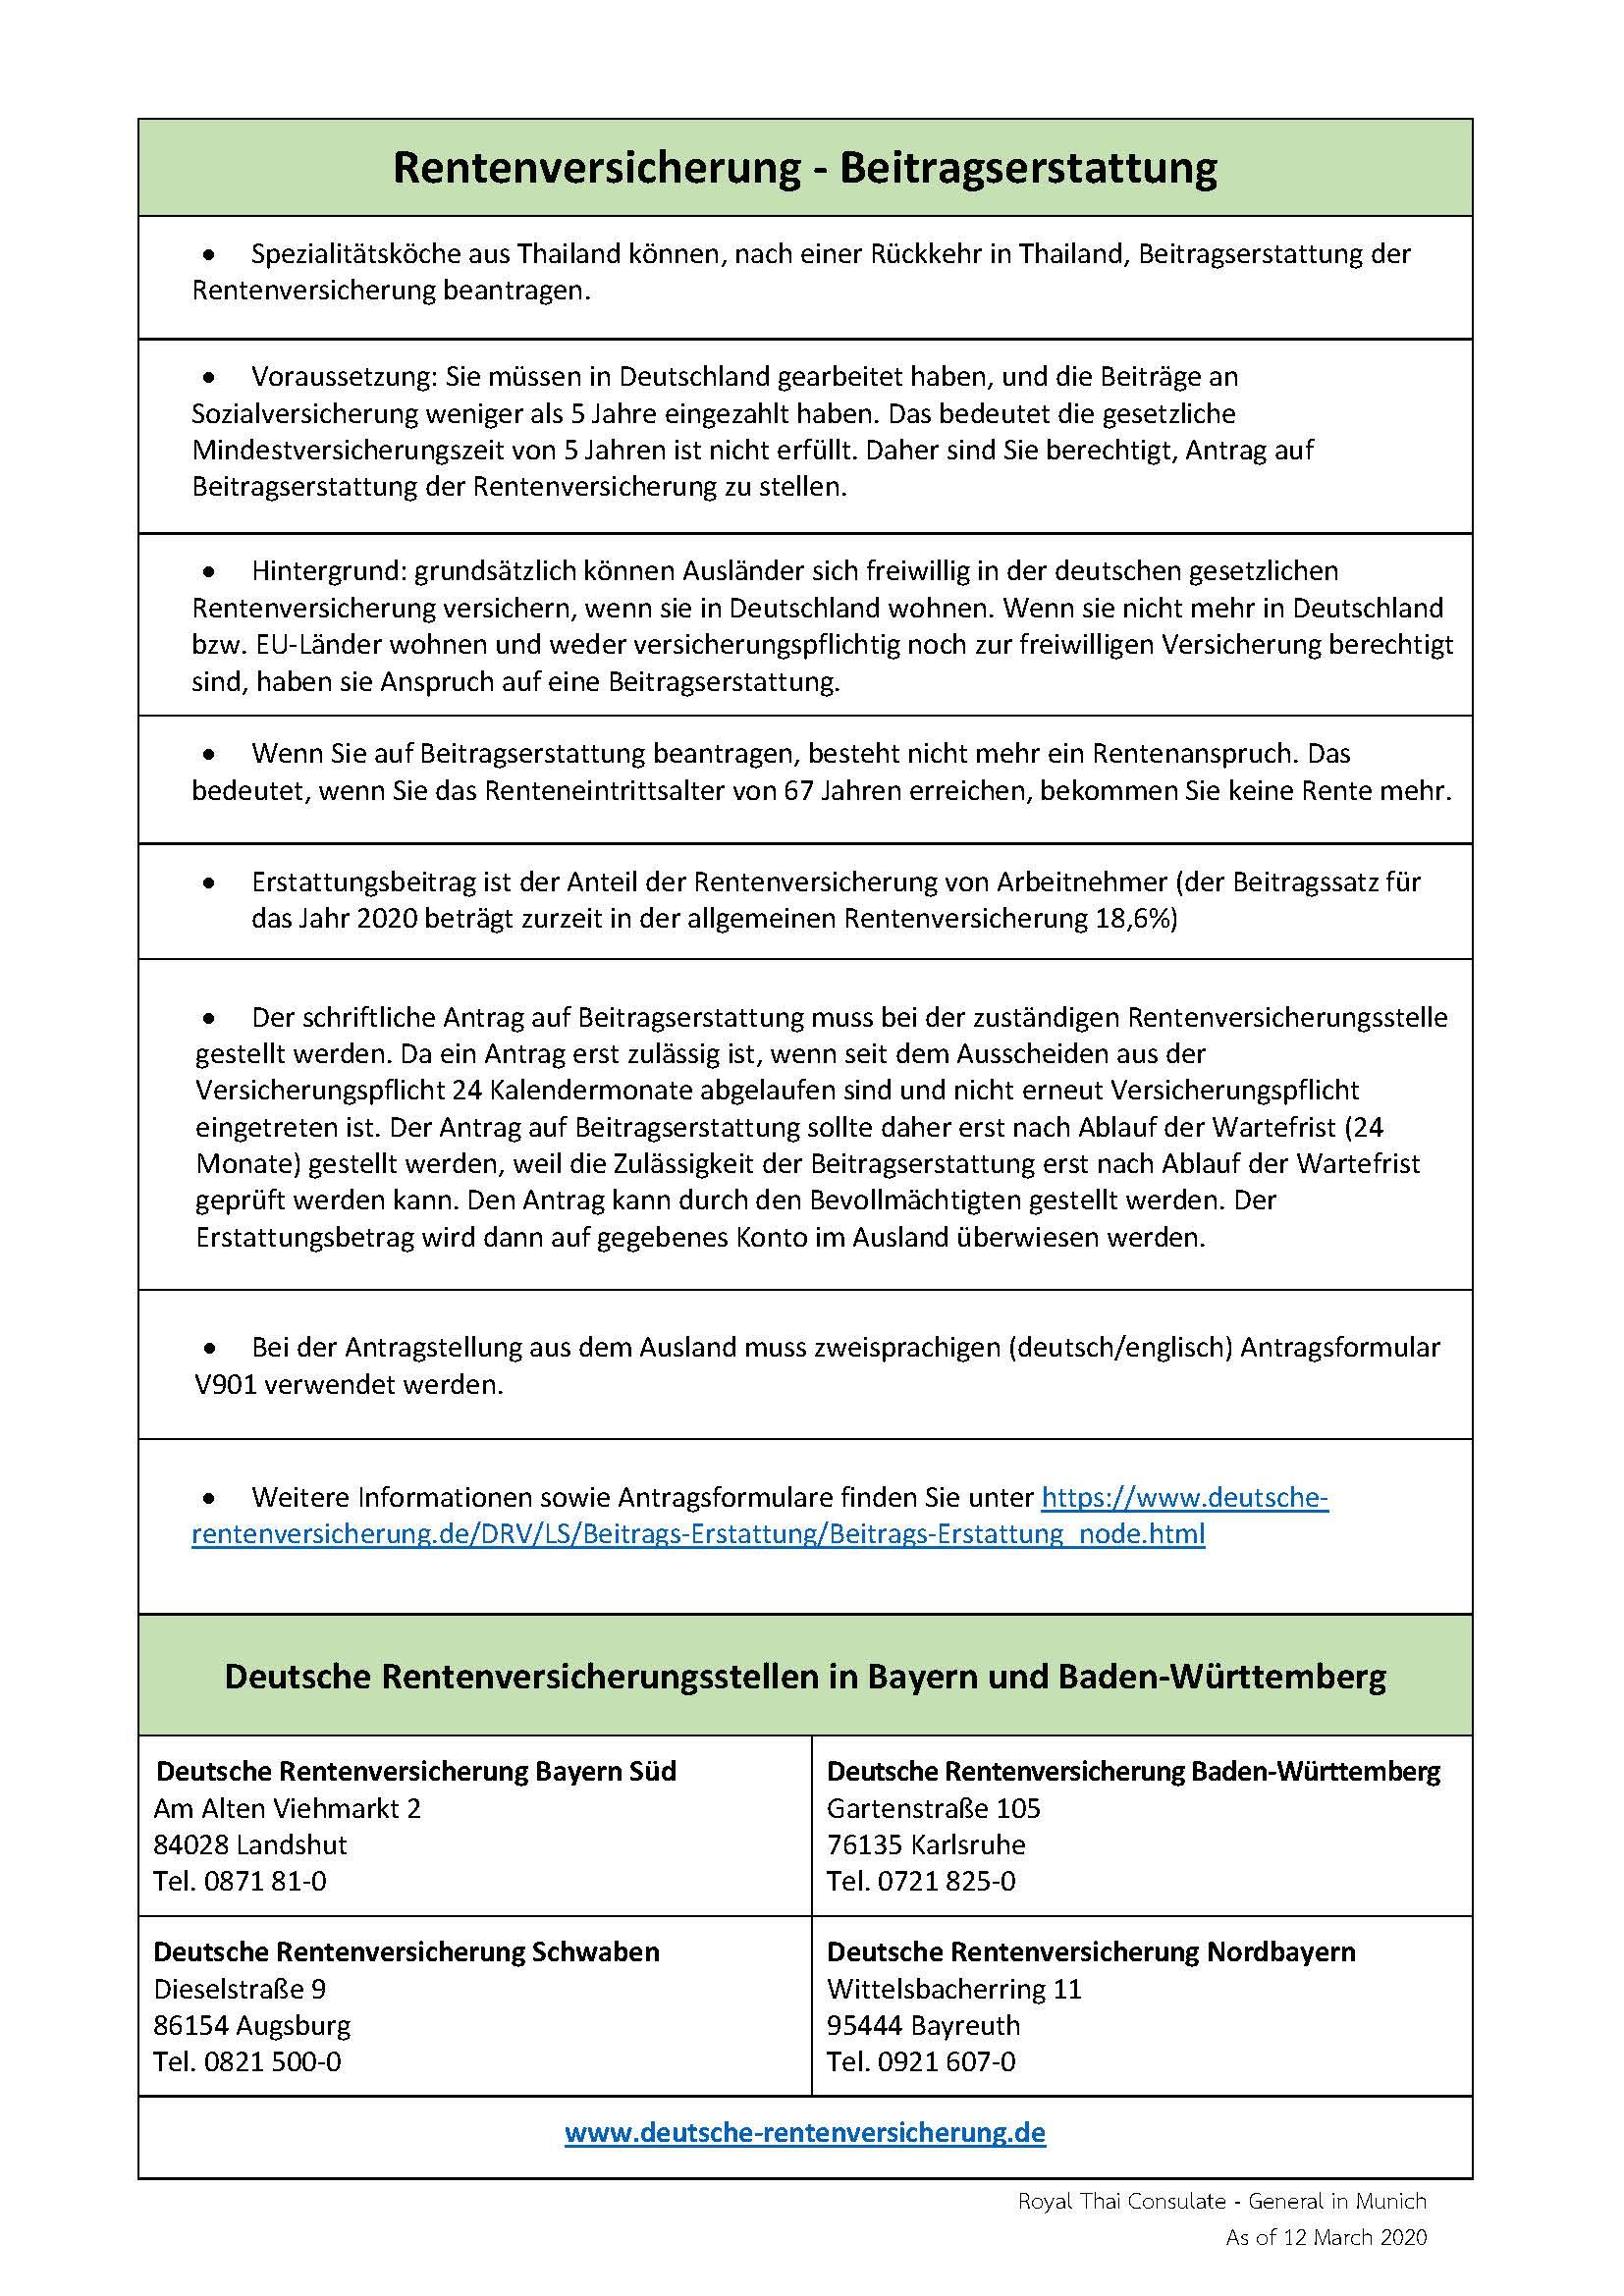 Infoblatt_-_Rentenversicherung_Beitragerstattung